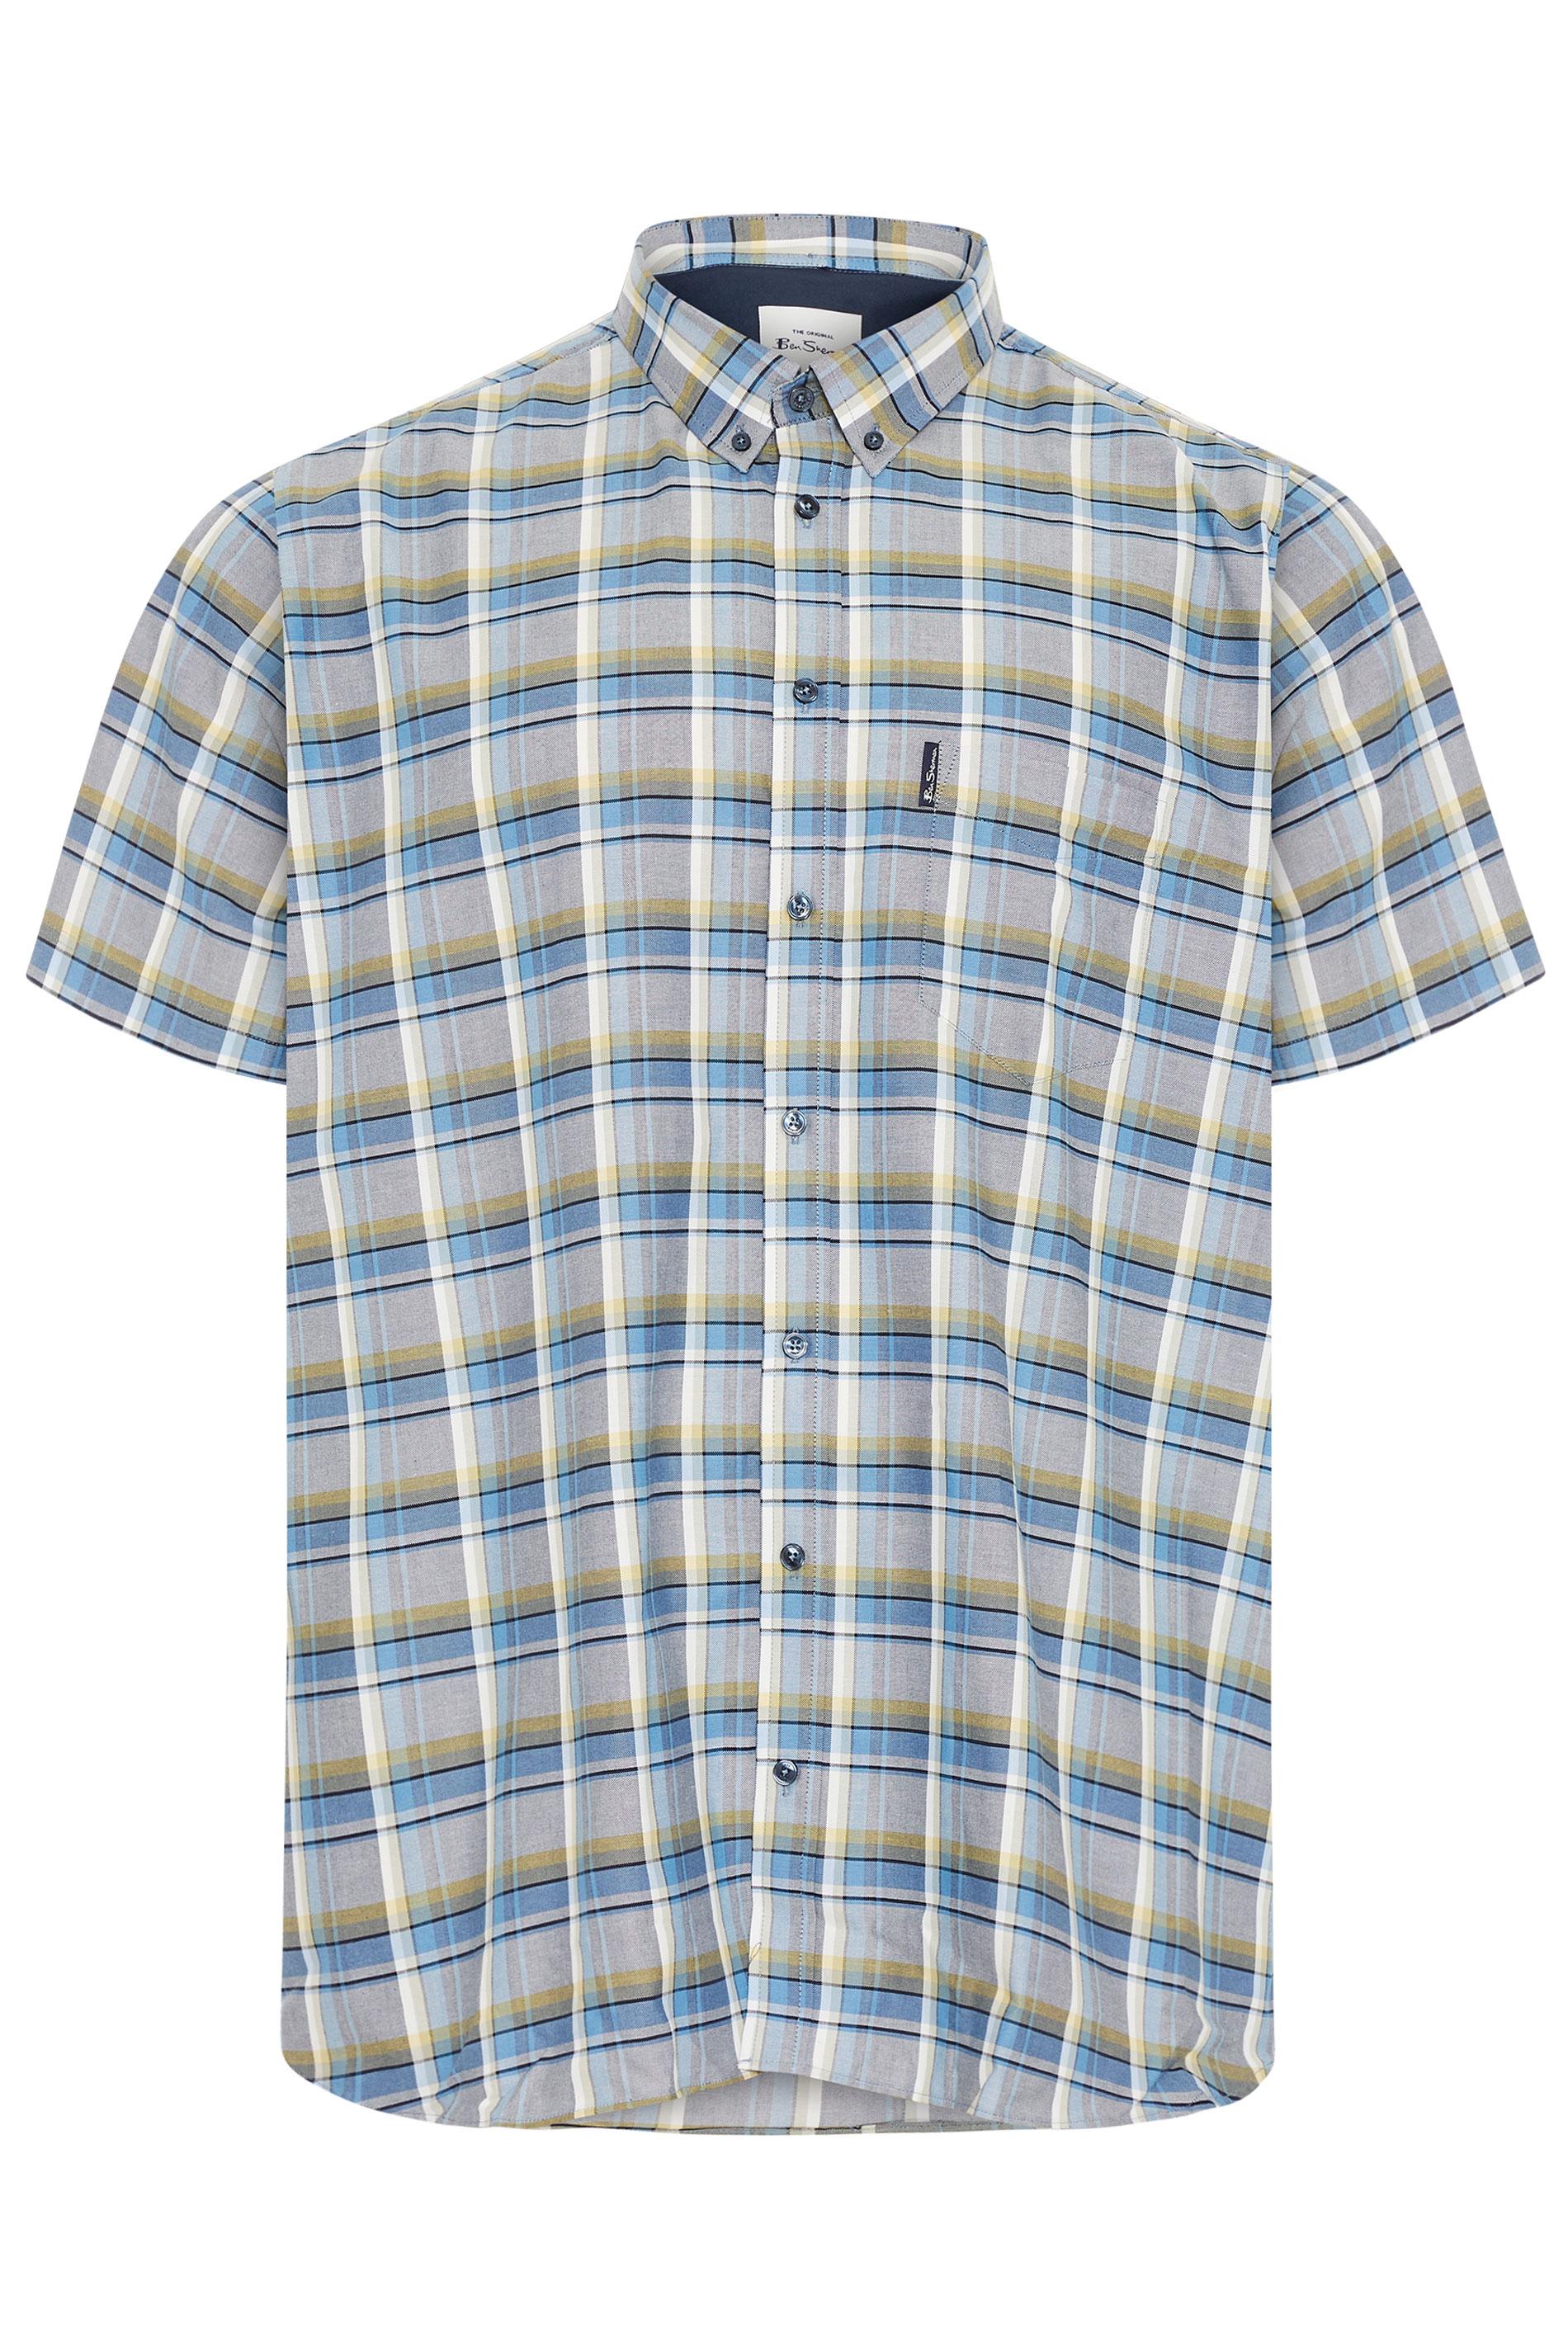 BEN SHERMAN Blue & Yellow Check Short Sleeve Shirt